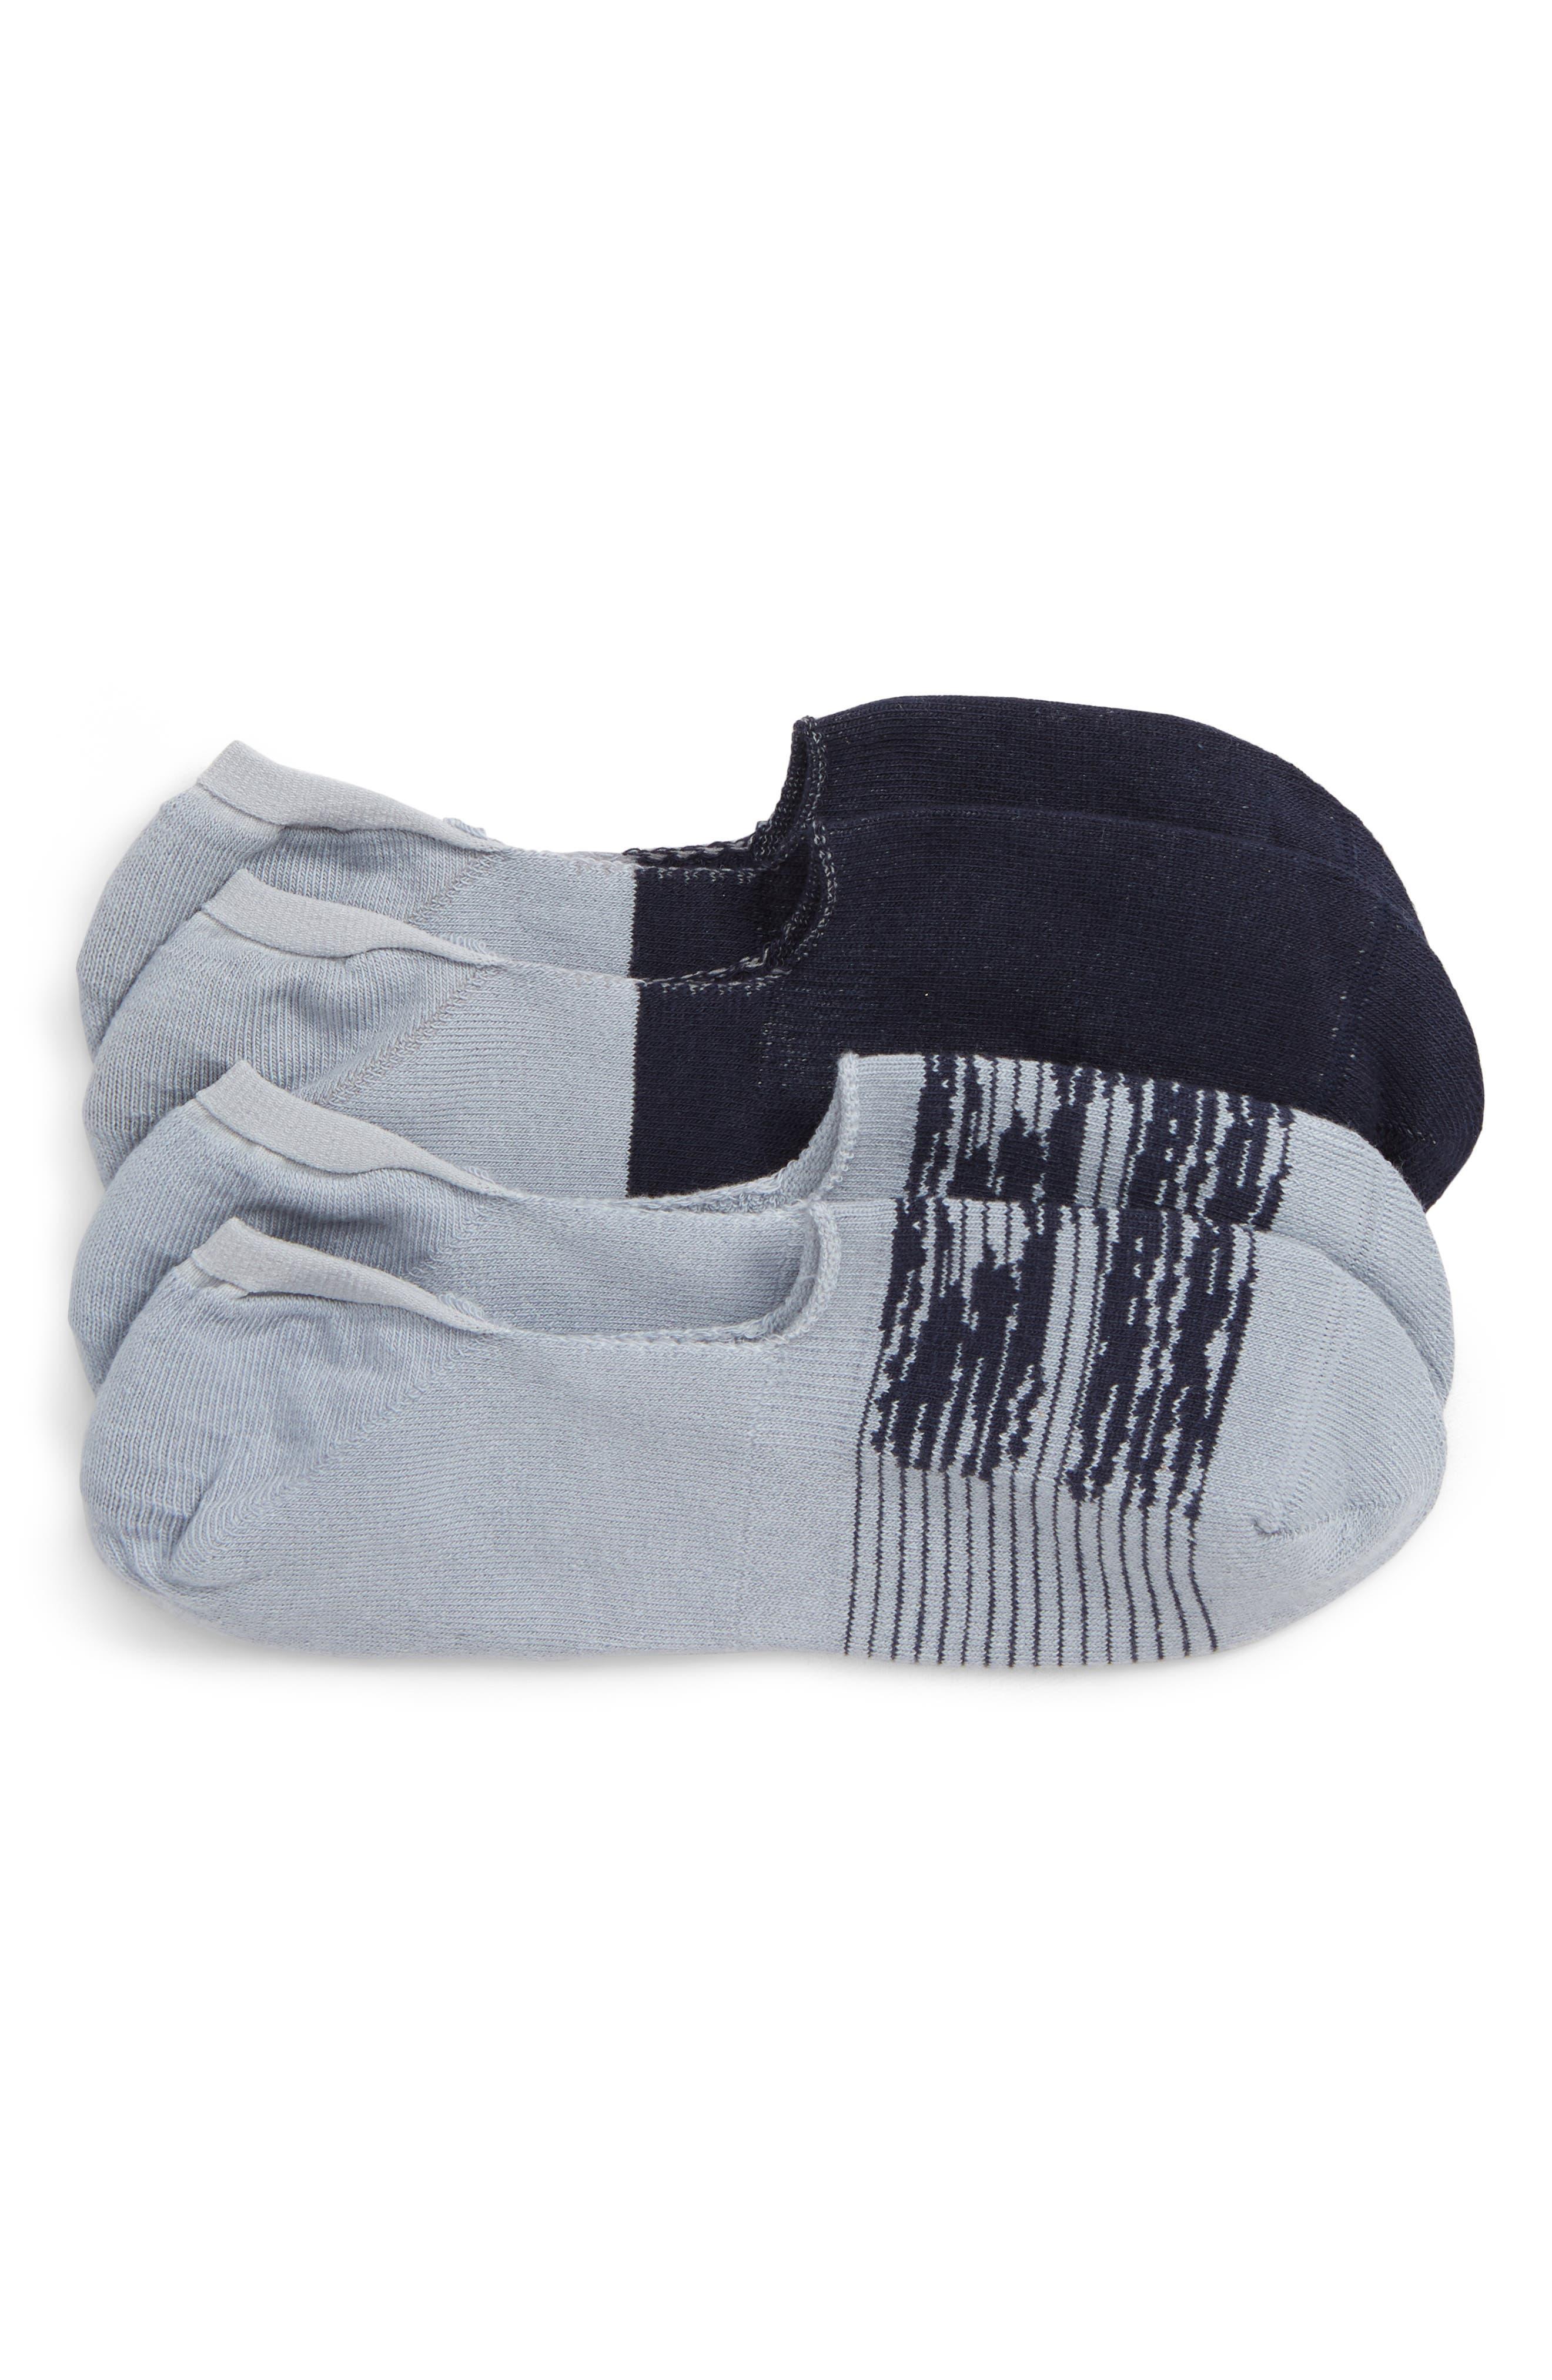 Assorted 2-Pack Liner Socks, Main, color, GREY/ NAVY